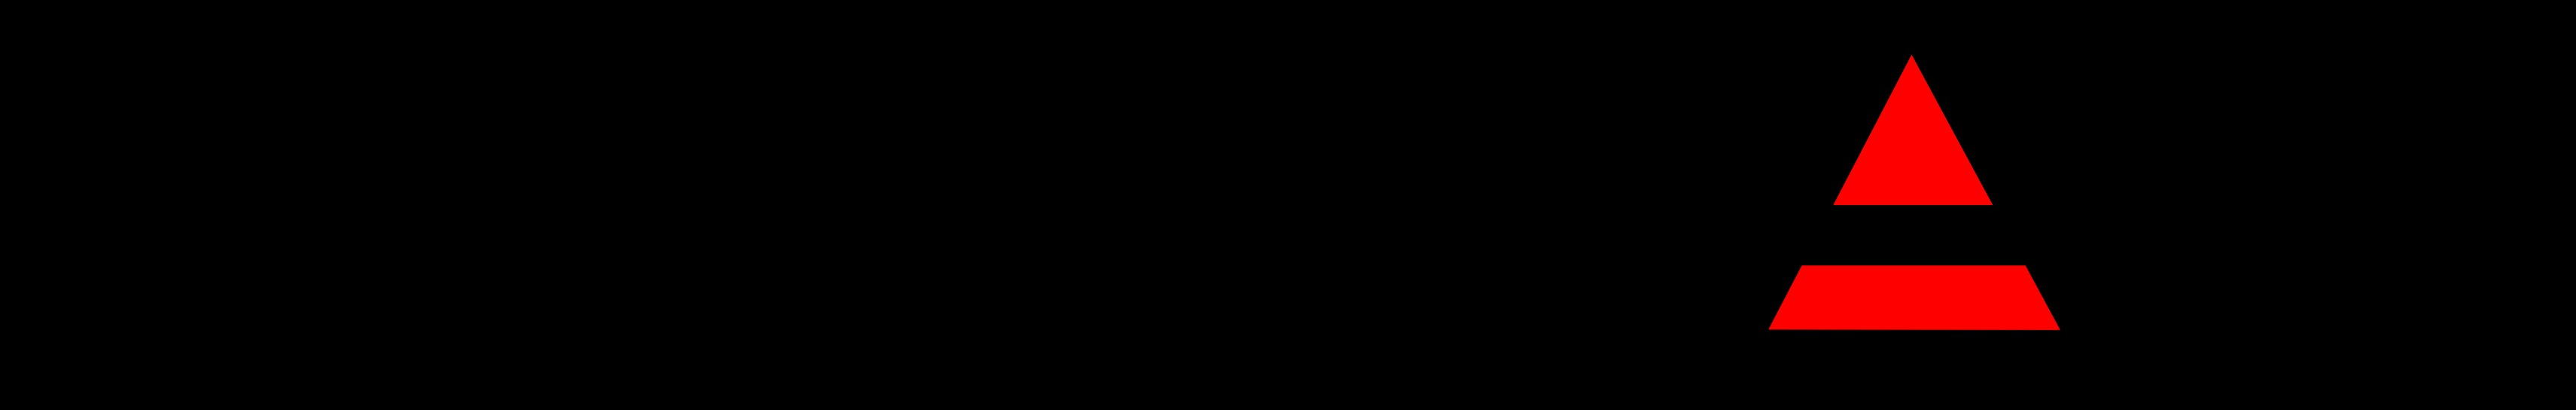 TECNAR